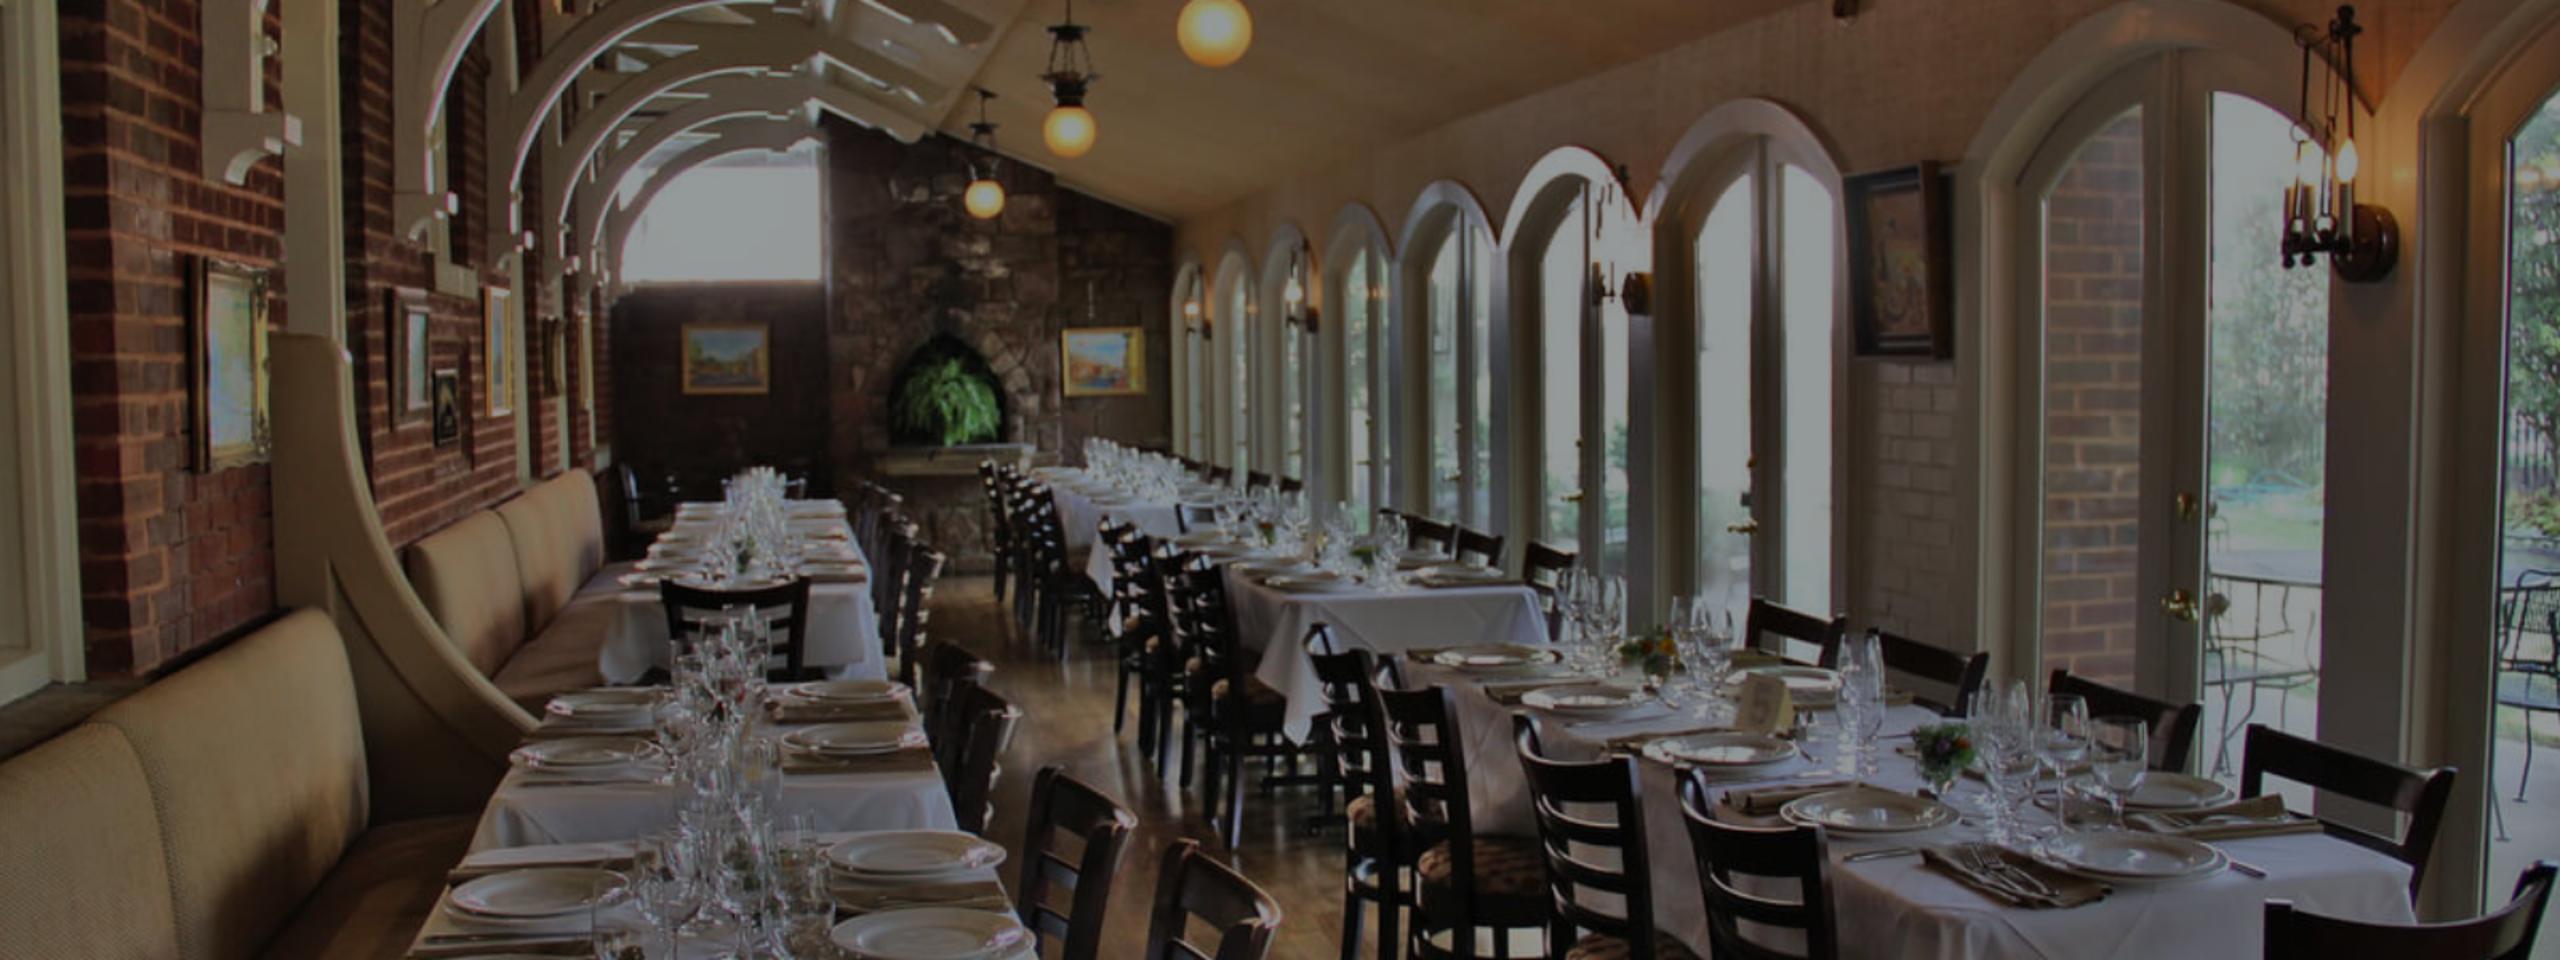 Restaurant Guide | Warrenton, VA